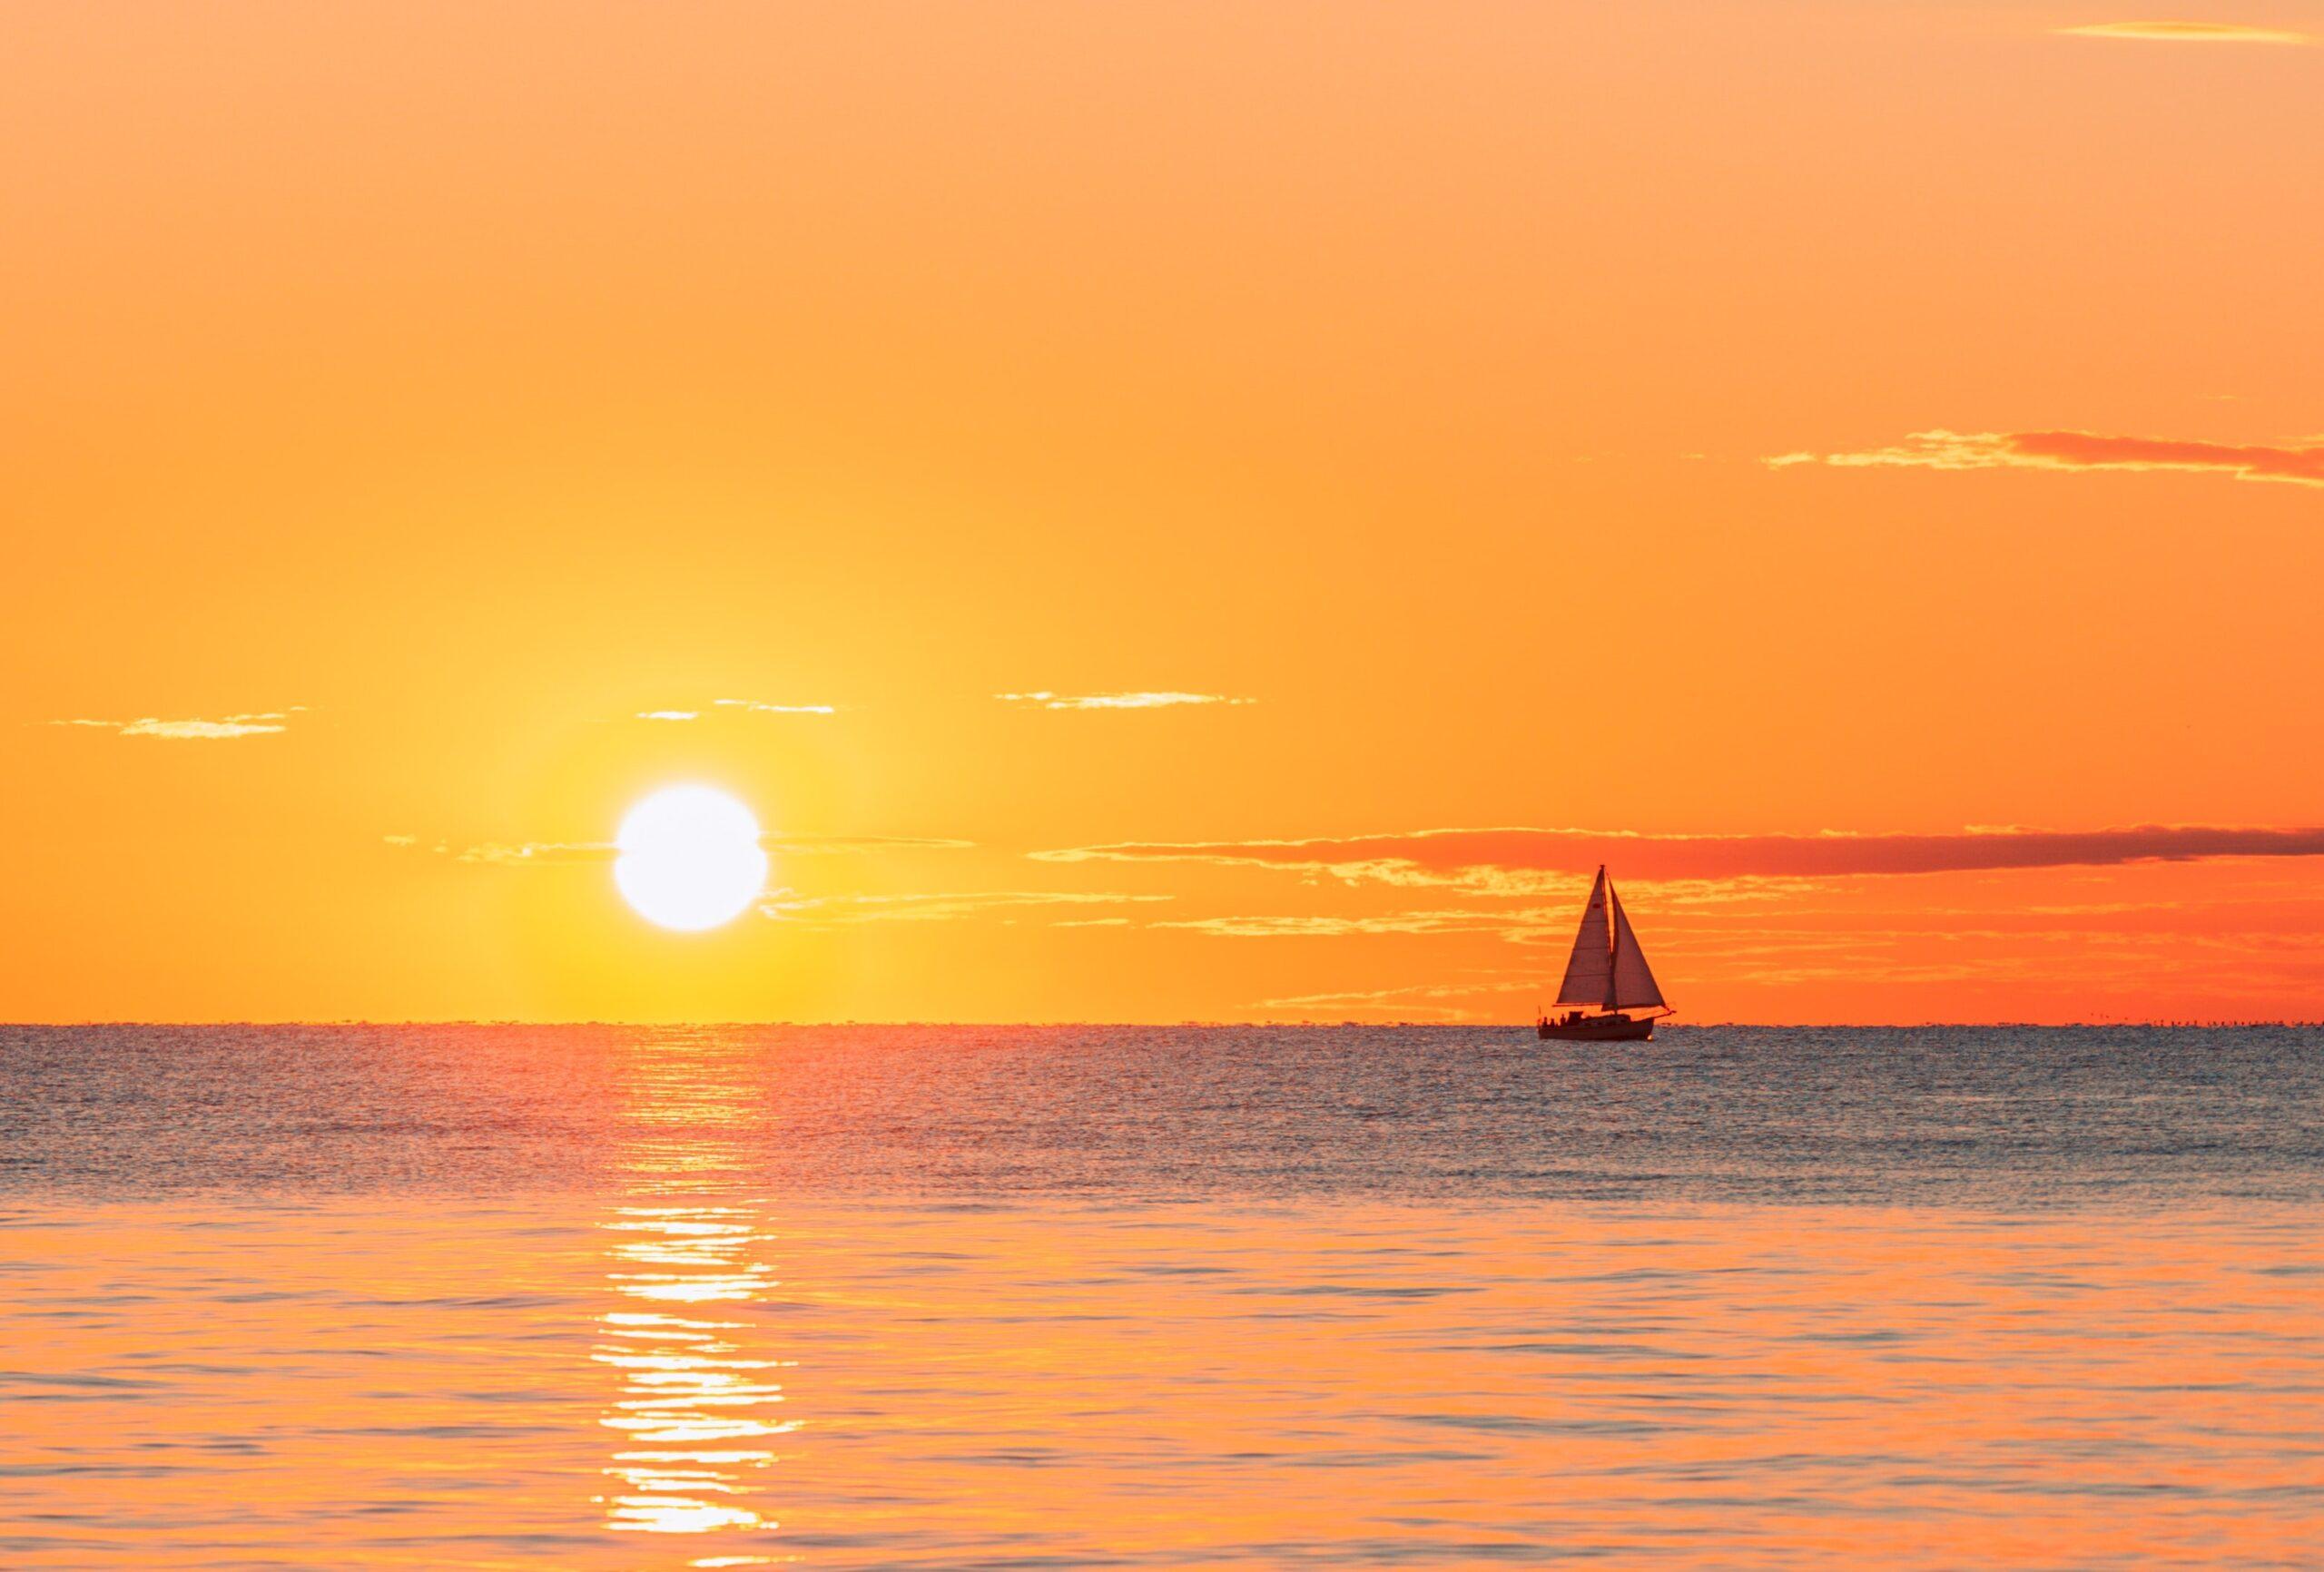 Sunset pexels-connor-martin-5526485